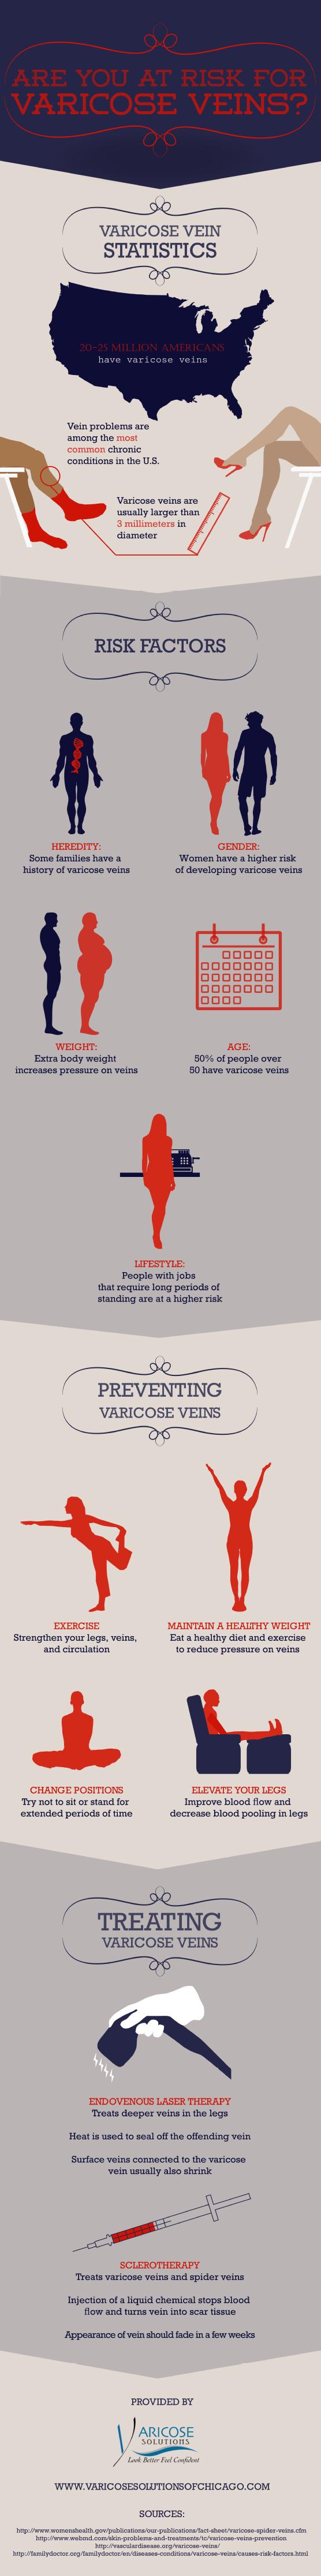 Vericose Veins Statistics